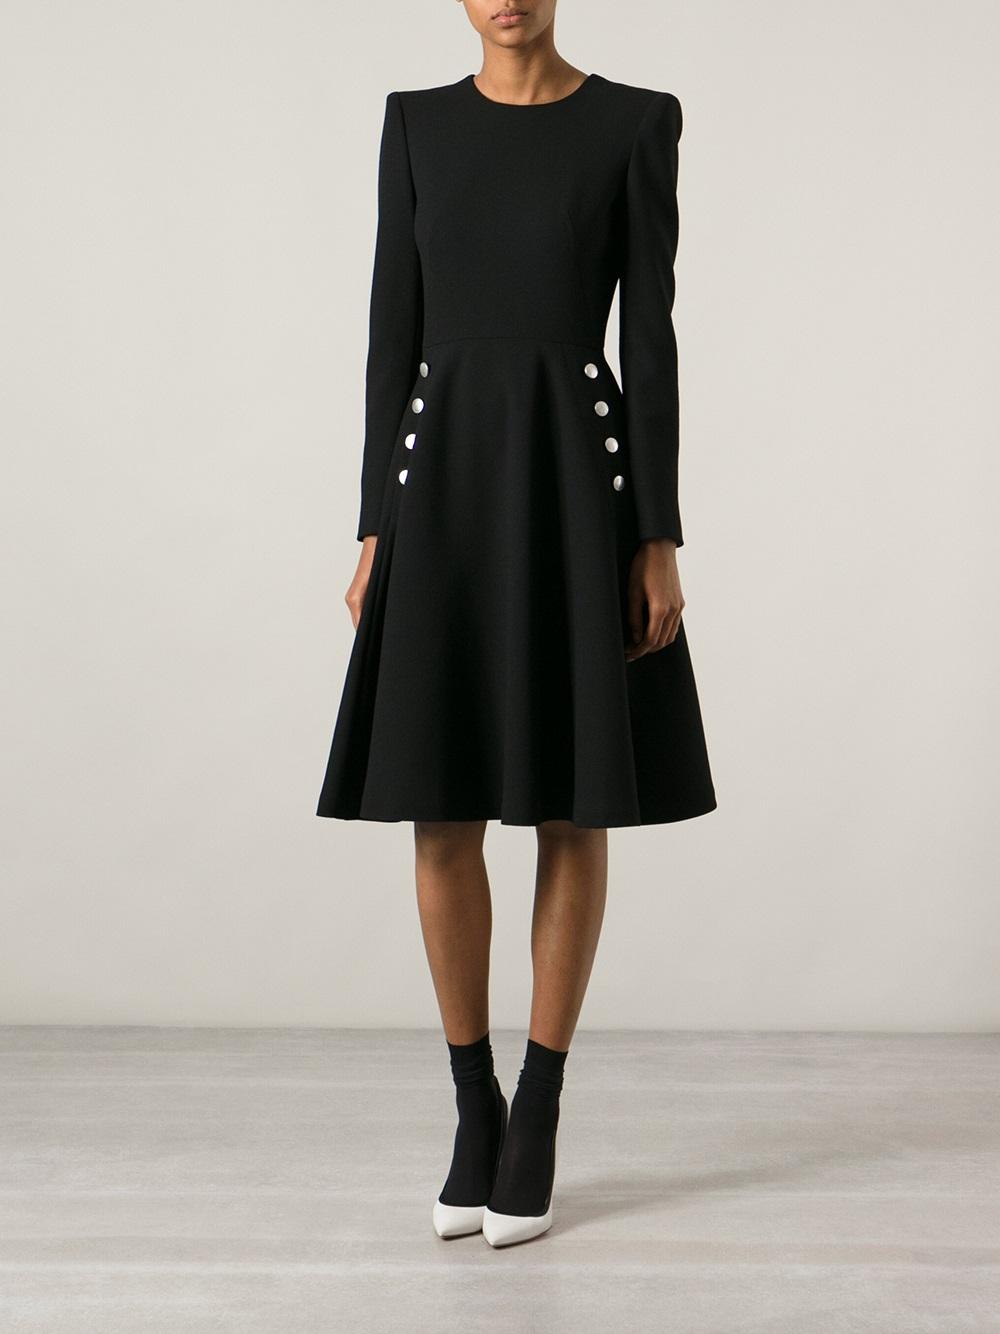 Alexander Mcqueen Fitted Waist Dress In Black Lyst